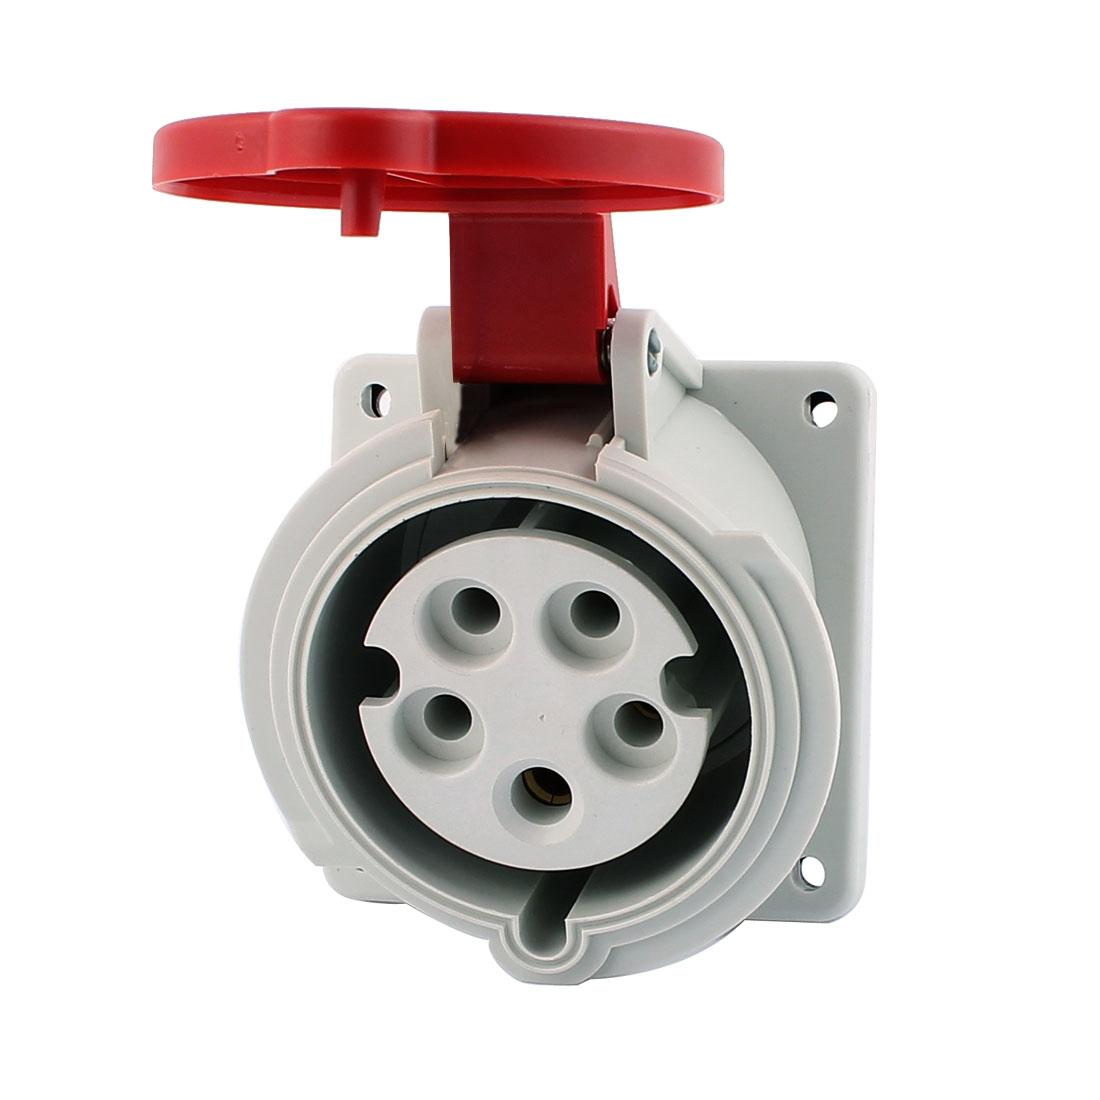 AC 240V-415V 32A IP44 3P+N+E 5-Terminal Female Industrial Oblique Socket